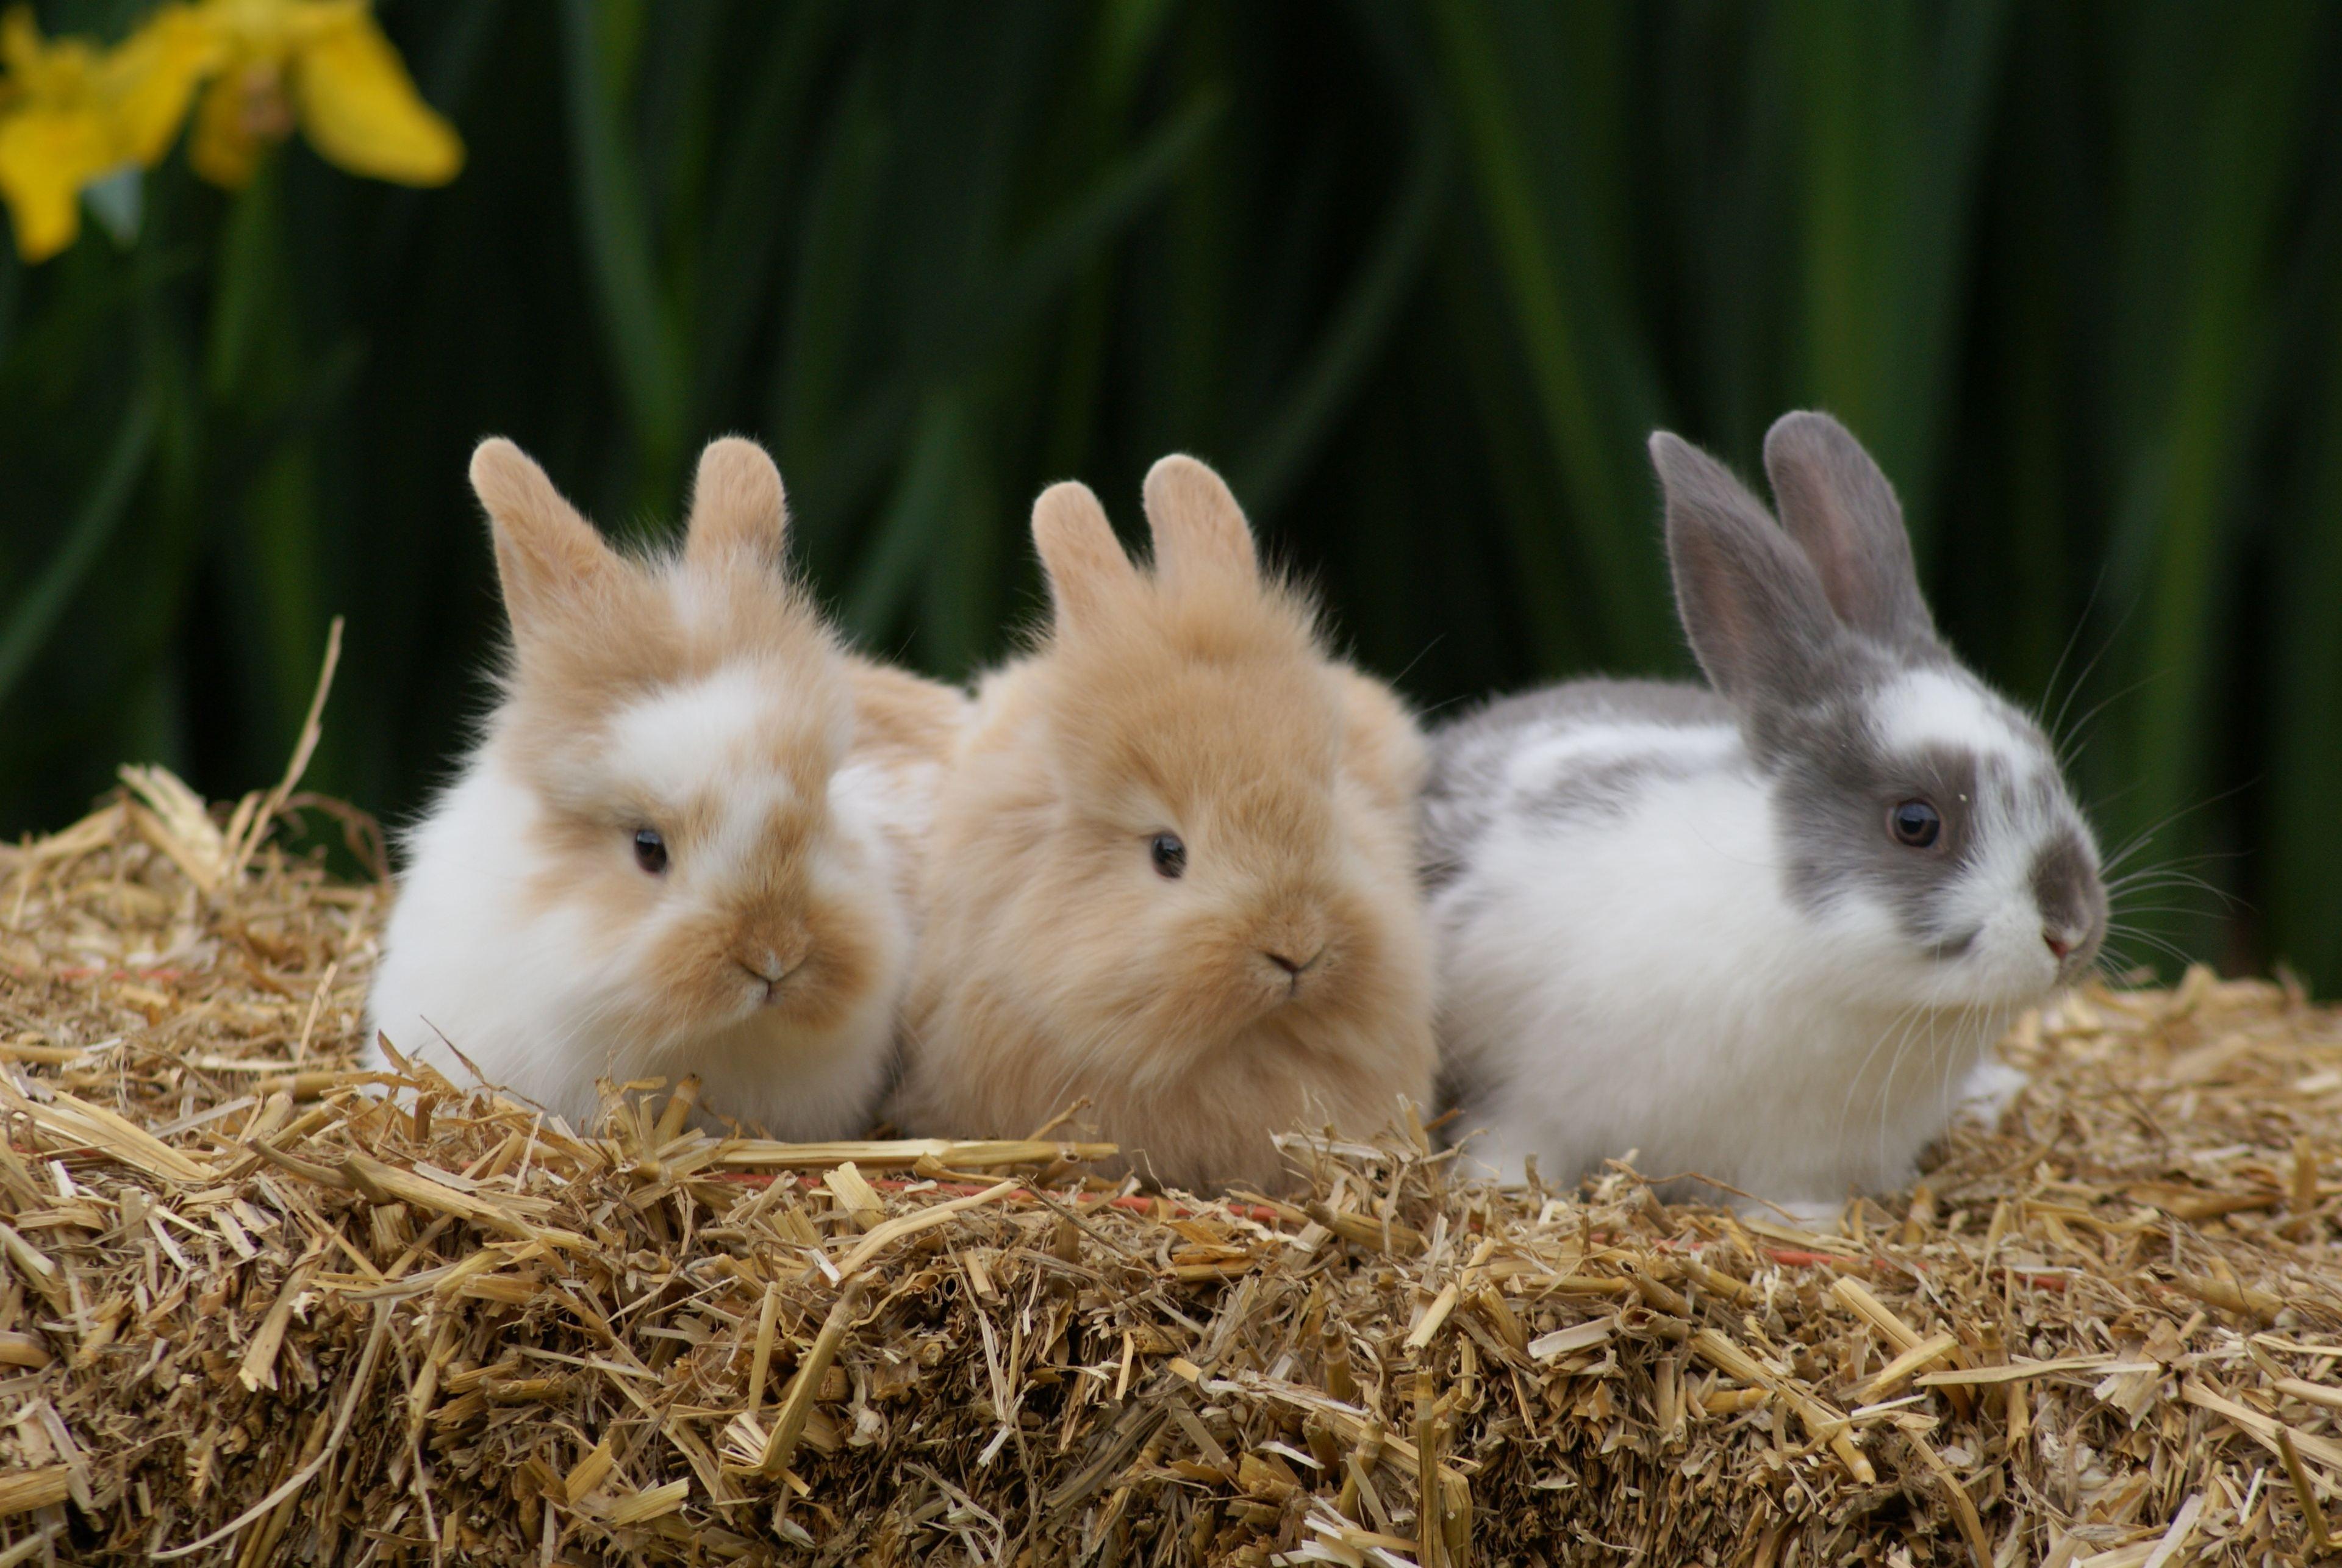 Violet and bunnies 033.jpg